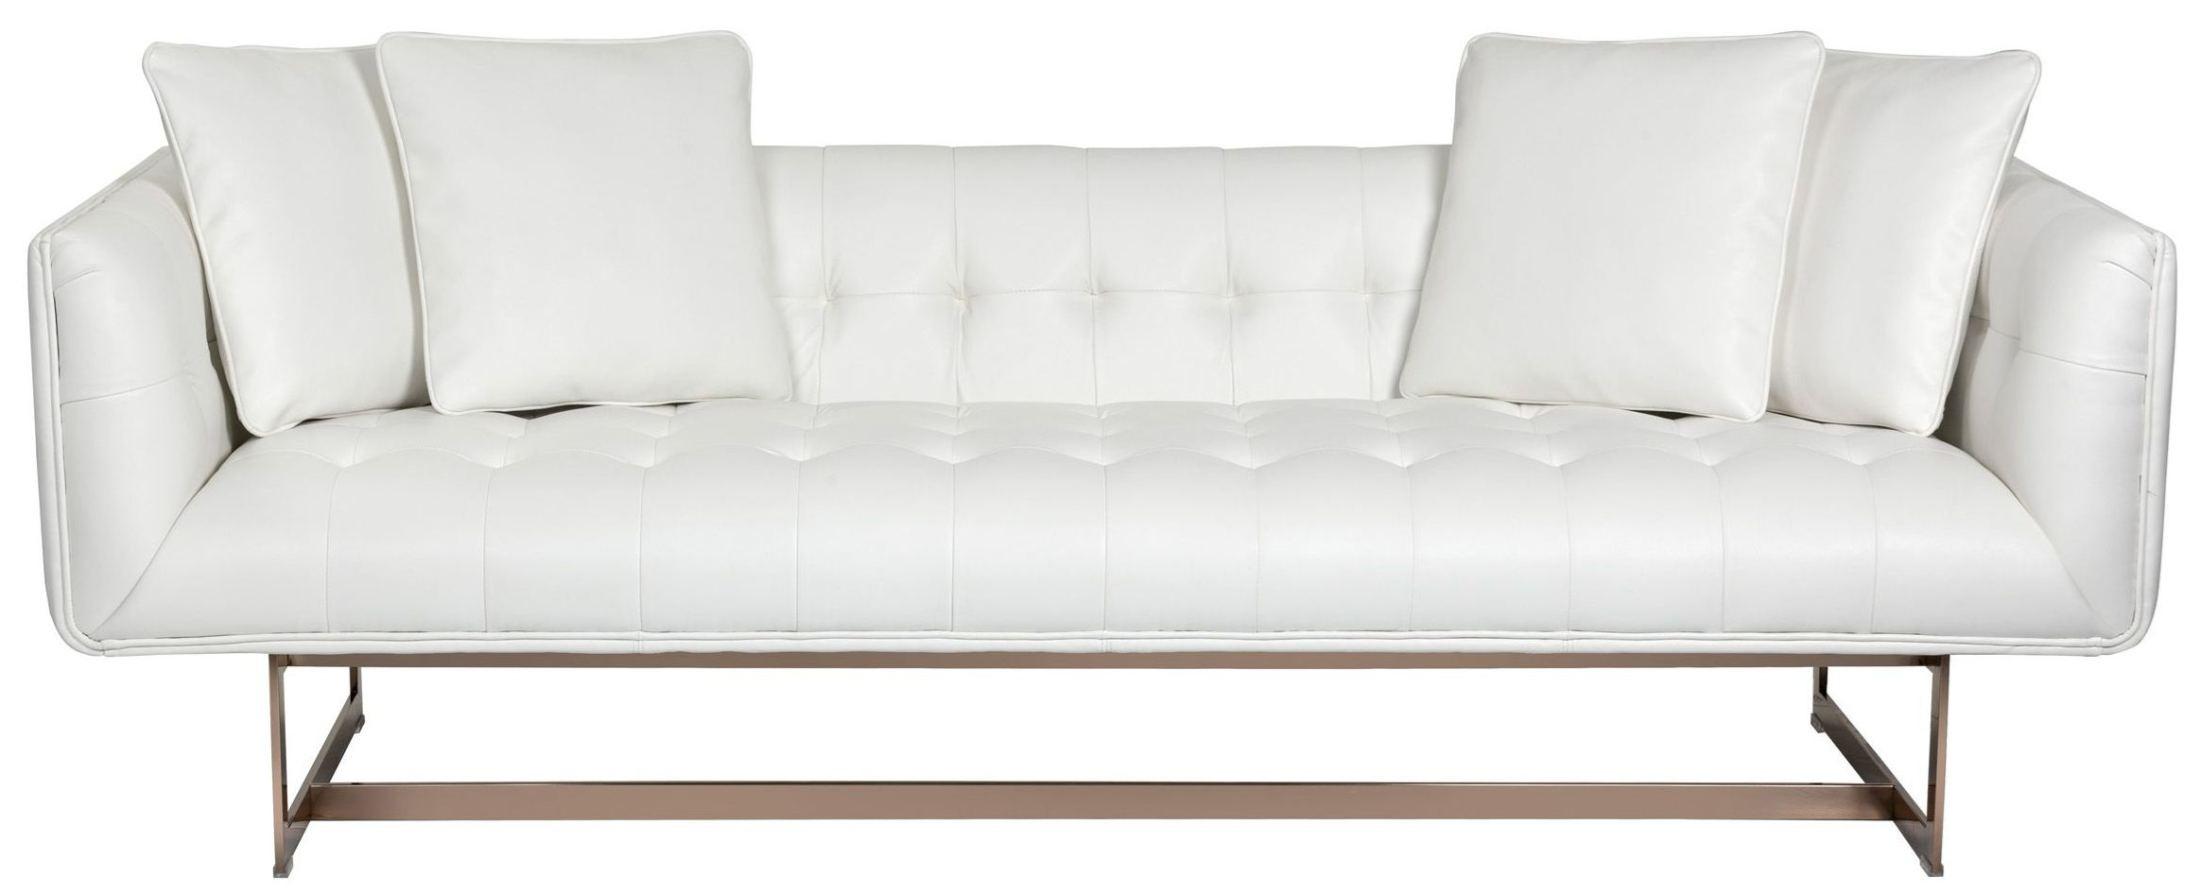 Matisse White Leather Sofa 100620 Sunpan Modern Home